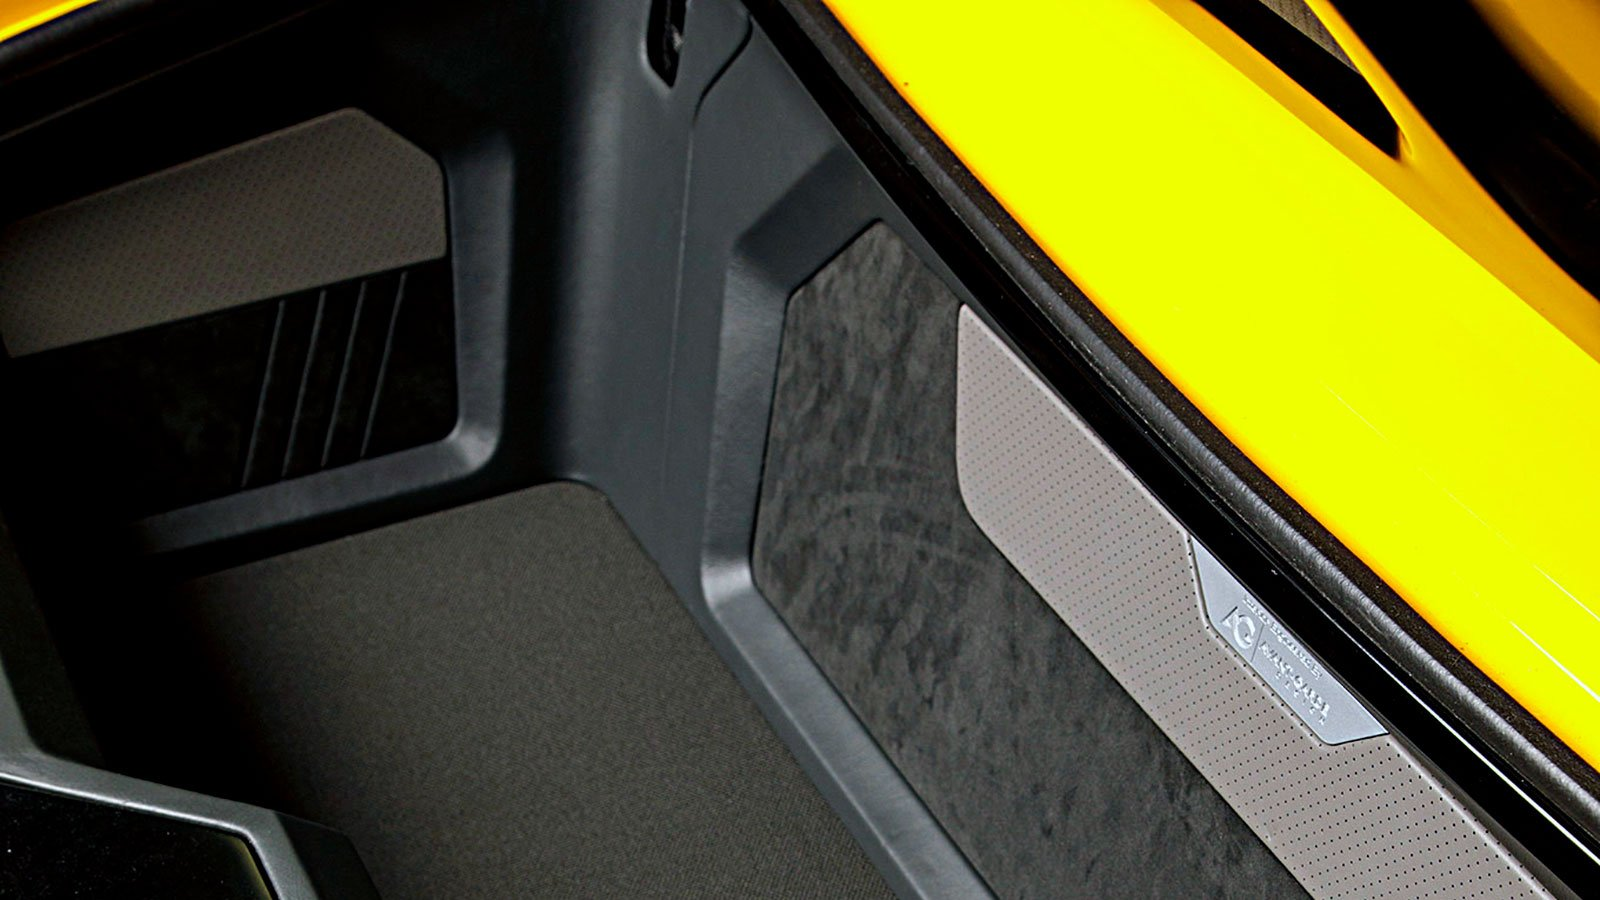 interior-trunk-closeup